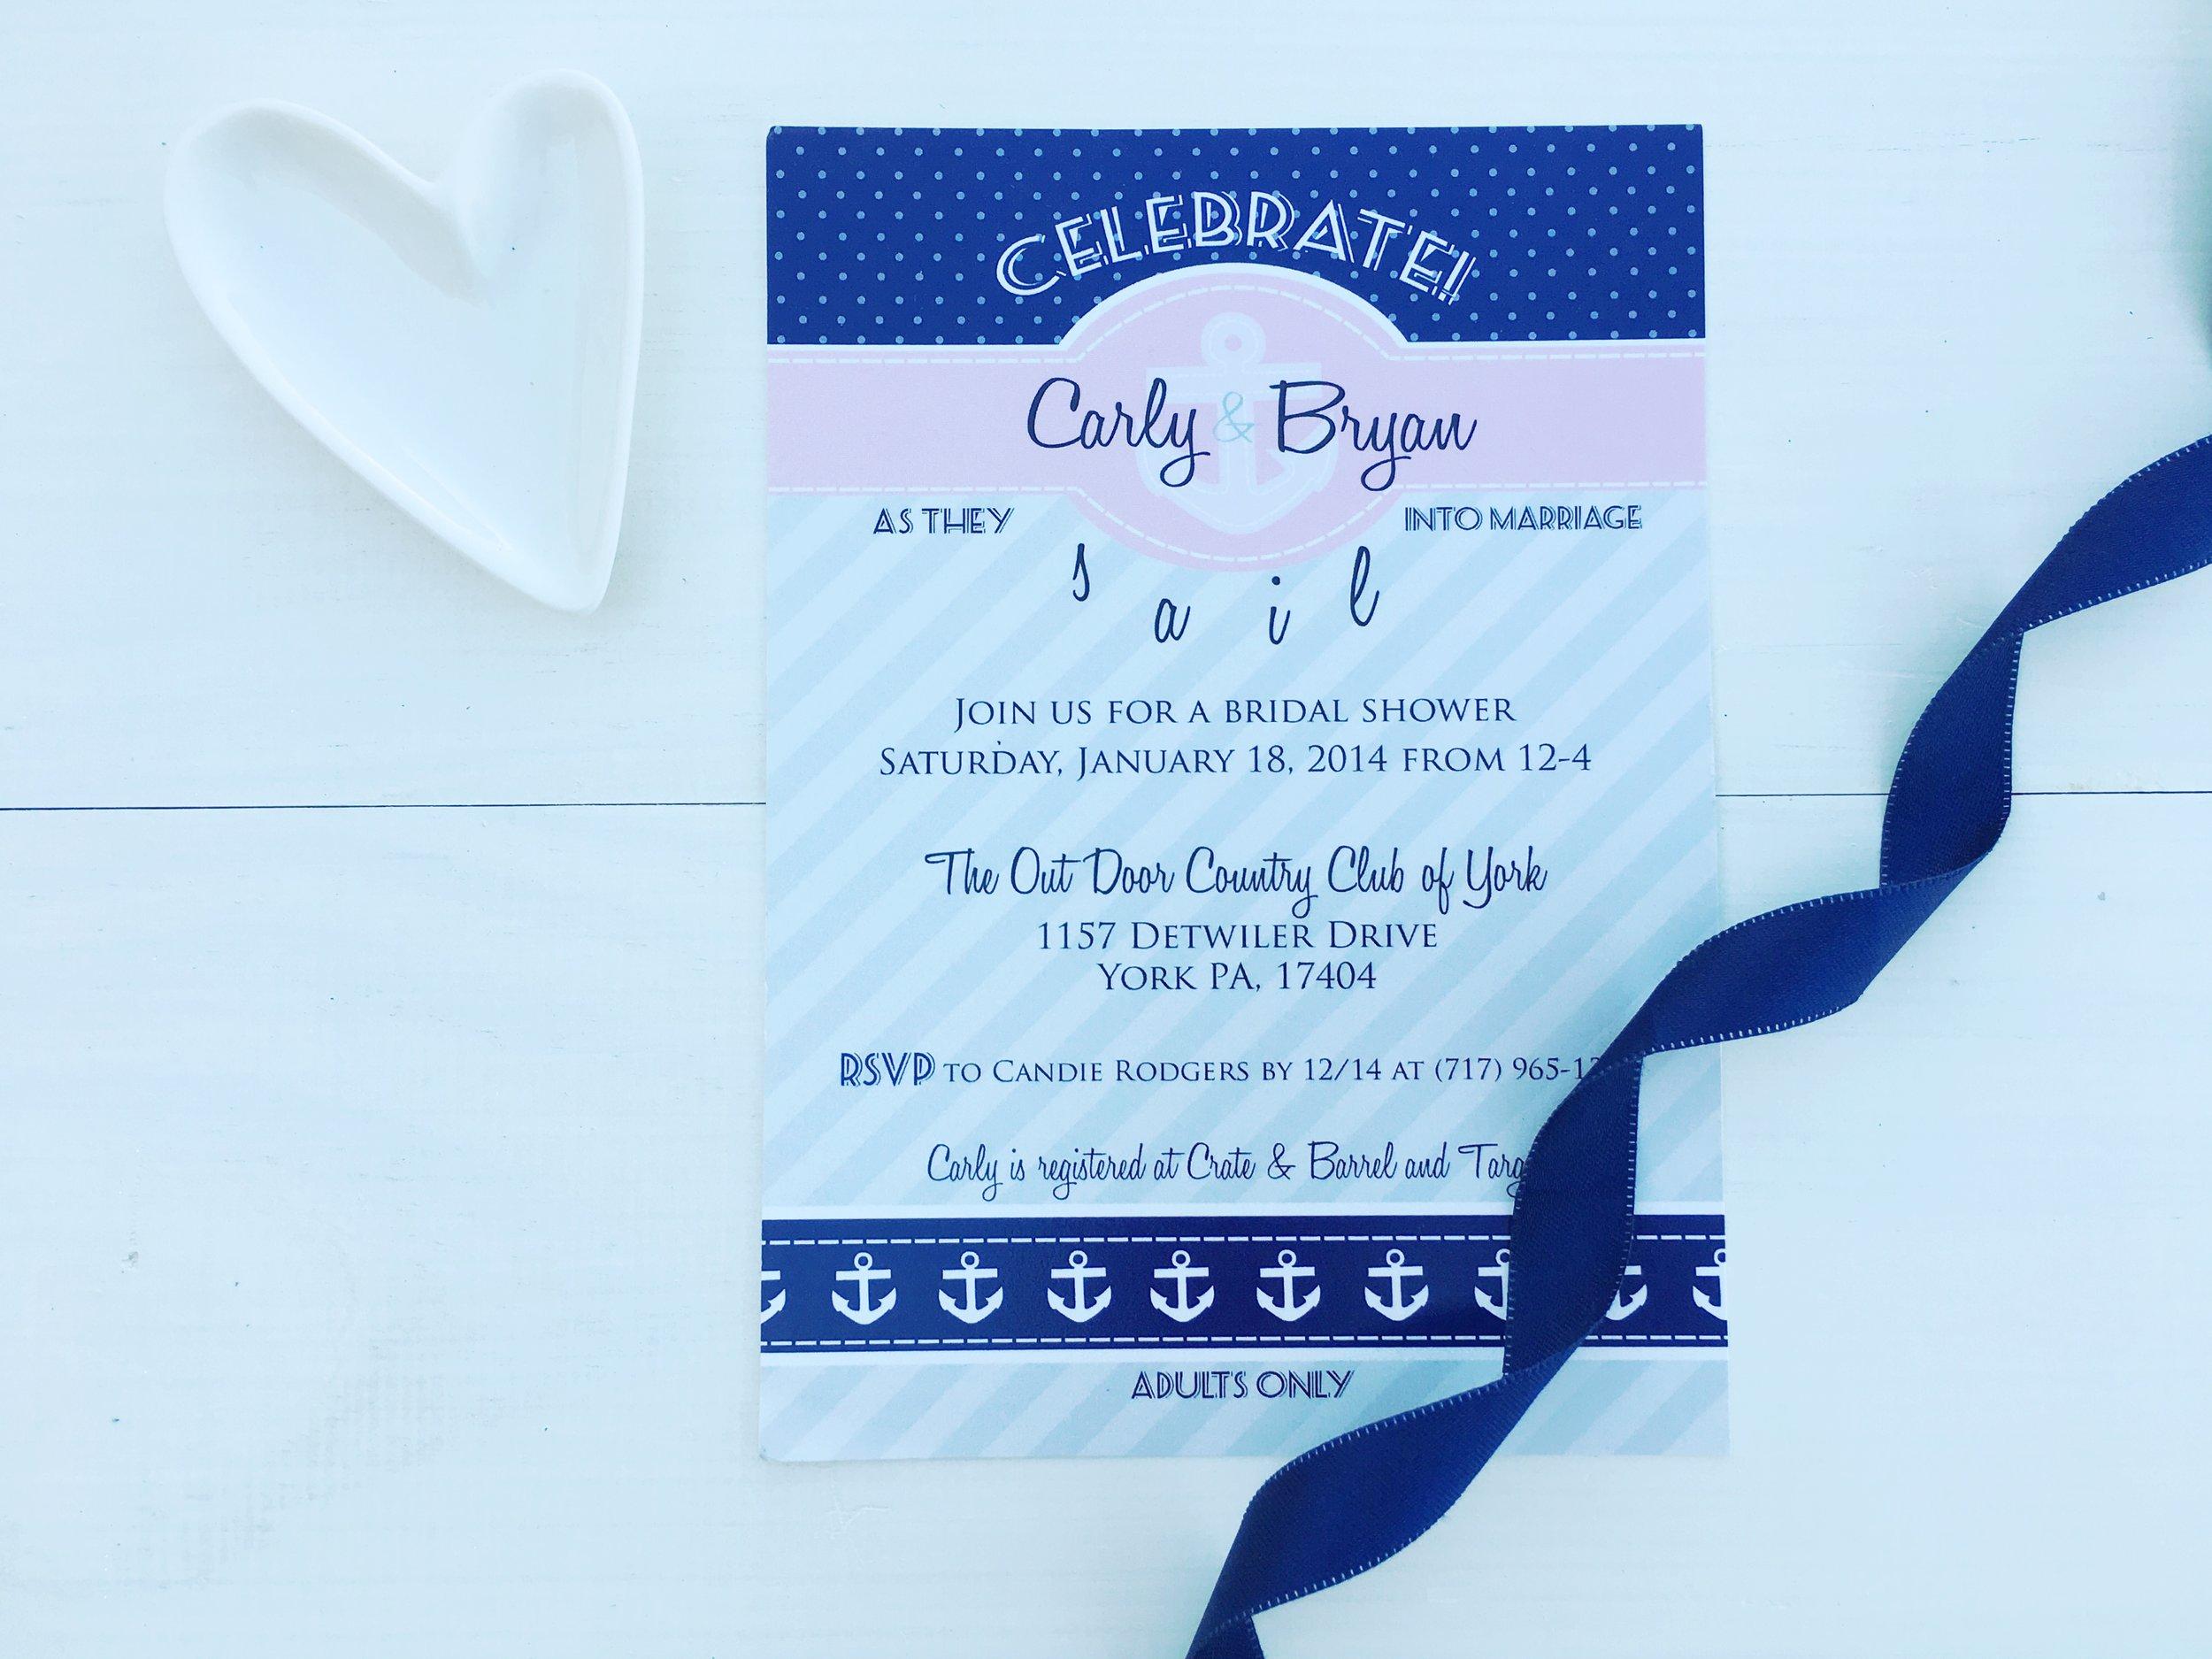 Central PA, York PA, JesSmith Designs, custom, wedding, invitations, bridal, announcements, save the date, baby, hanover, calligraphy, baltimore, wedding invitations, lancaster, gettysburg 5.jpg